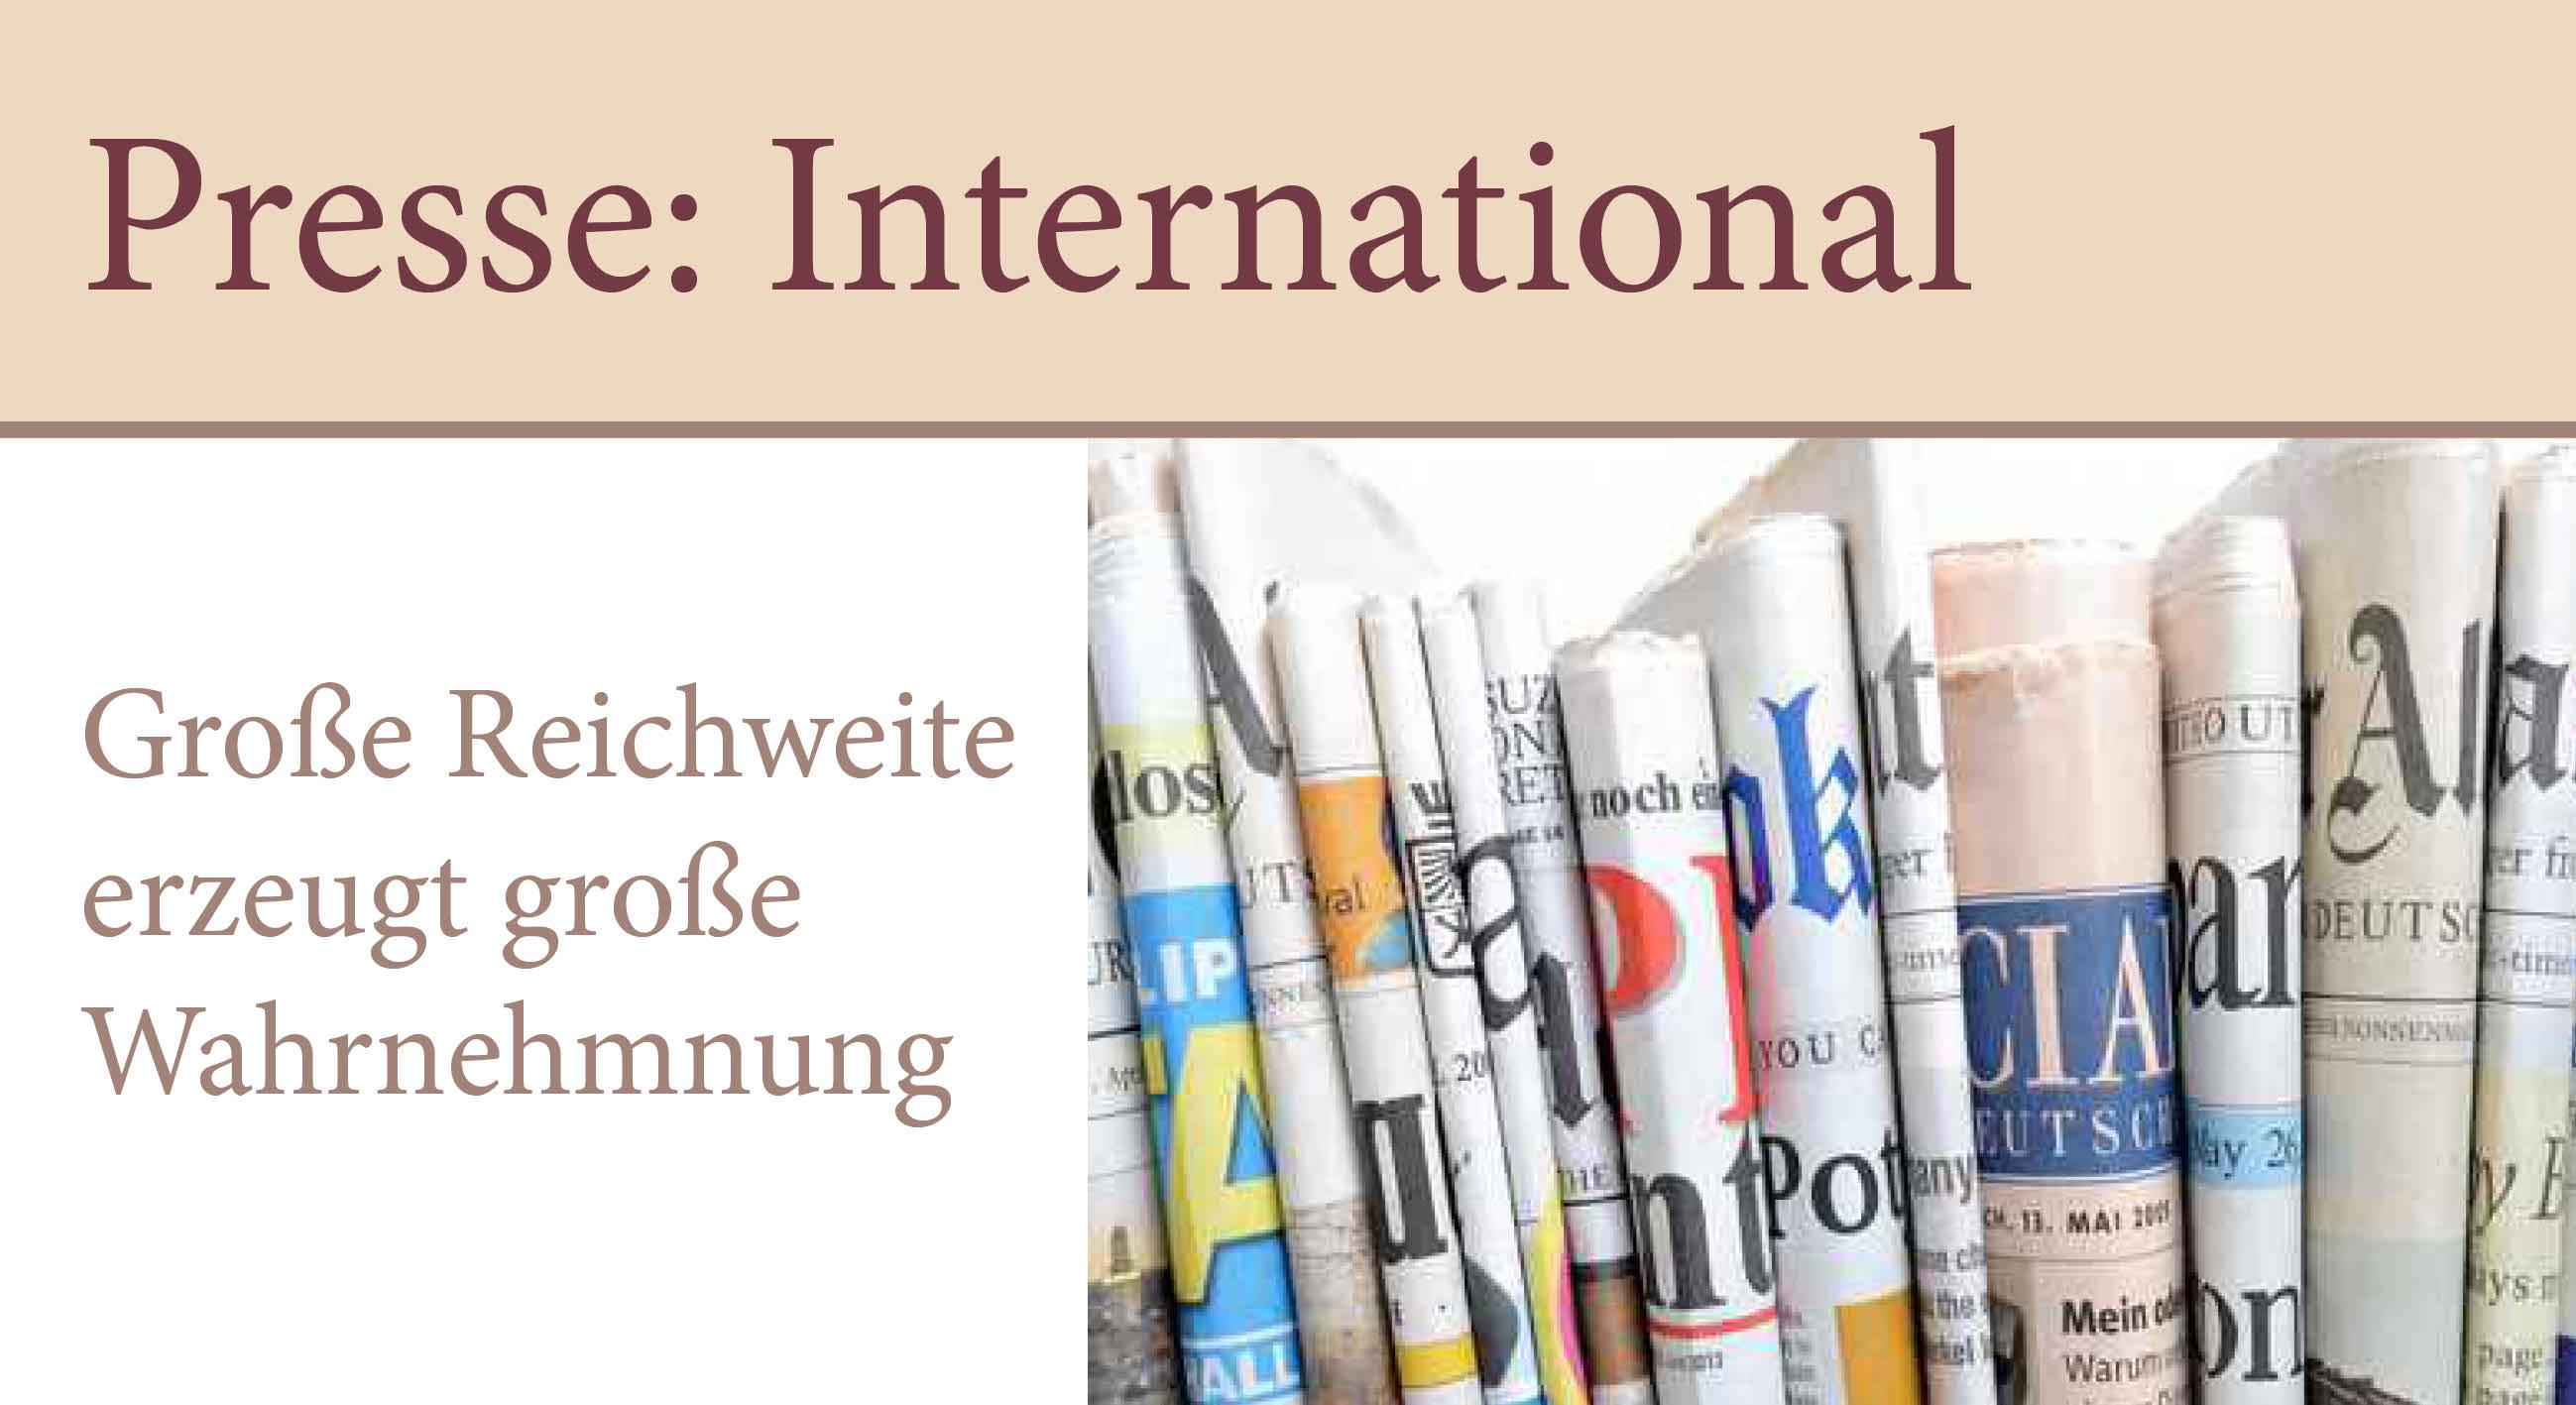 Presse International